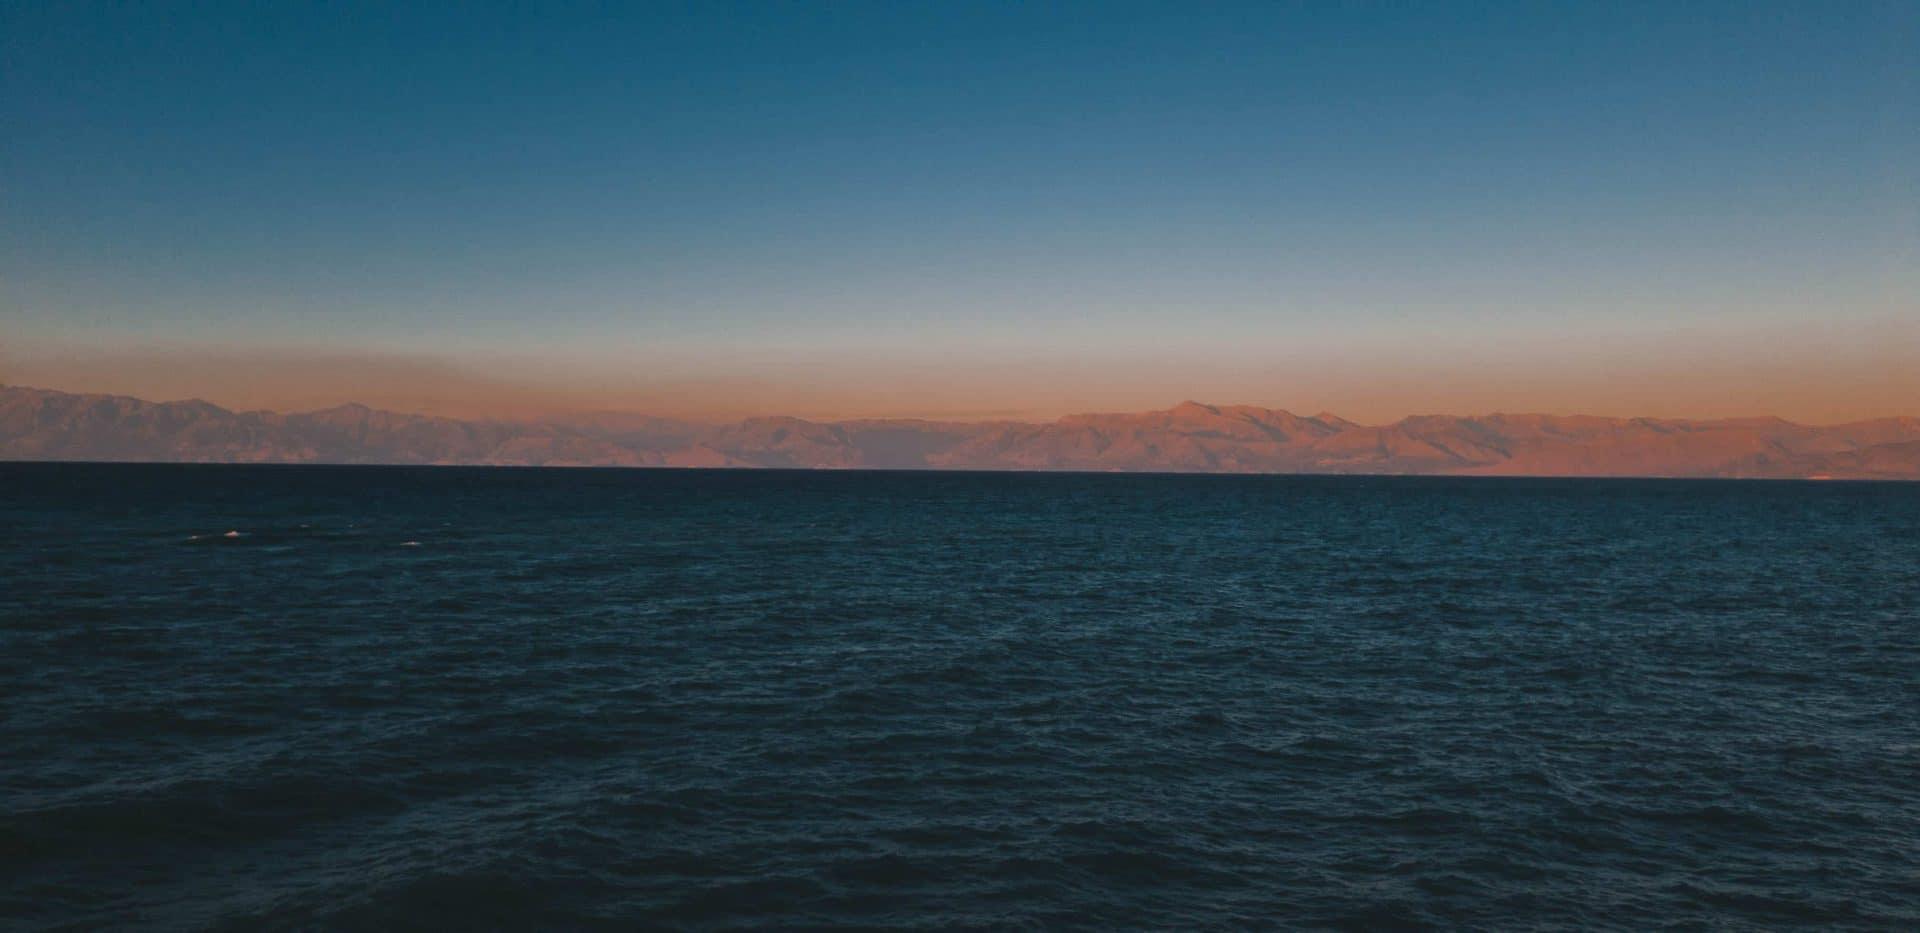 grece-corfou-sidari-vue-canal-d-amour-goyav